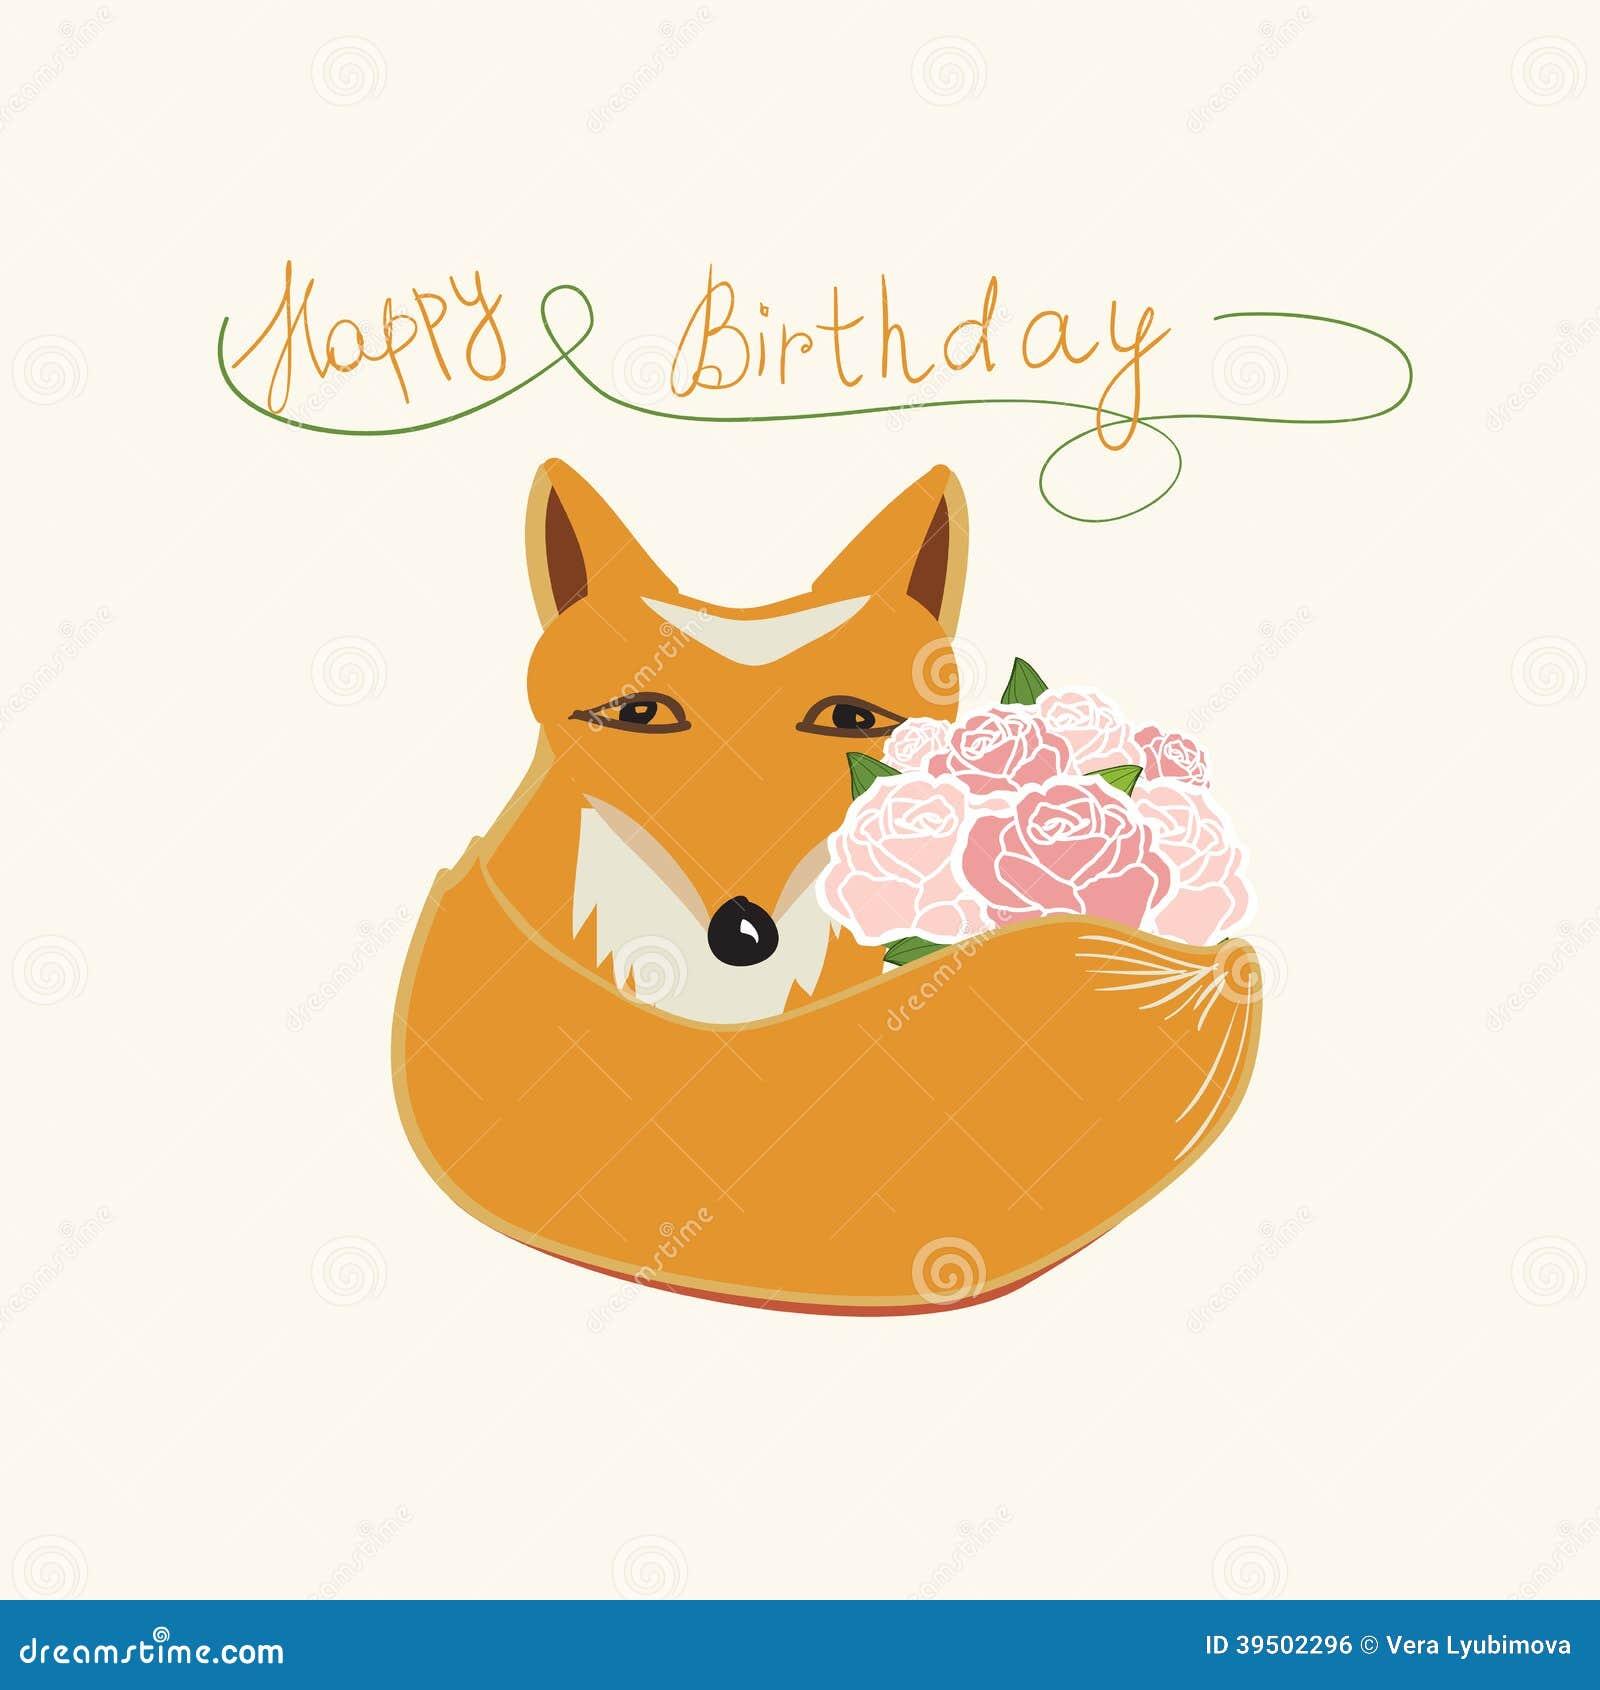 Happy Birthday fox greeting card design